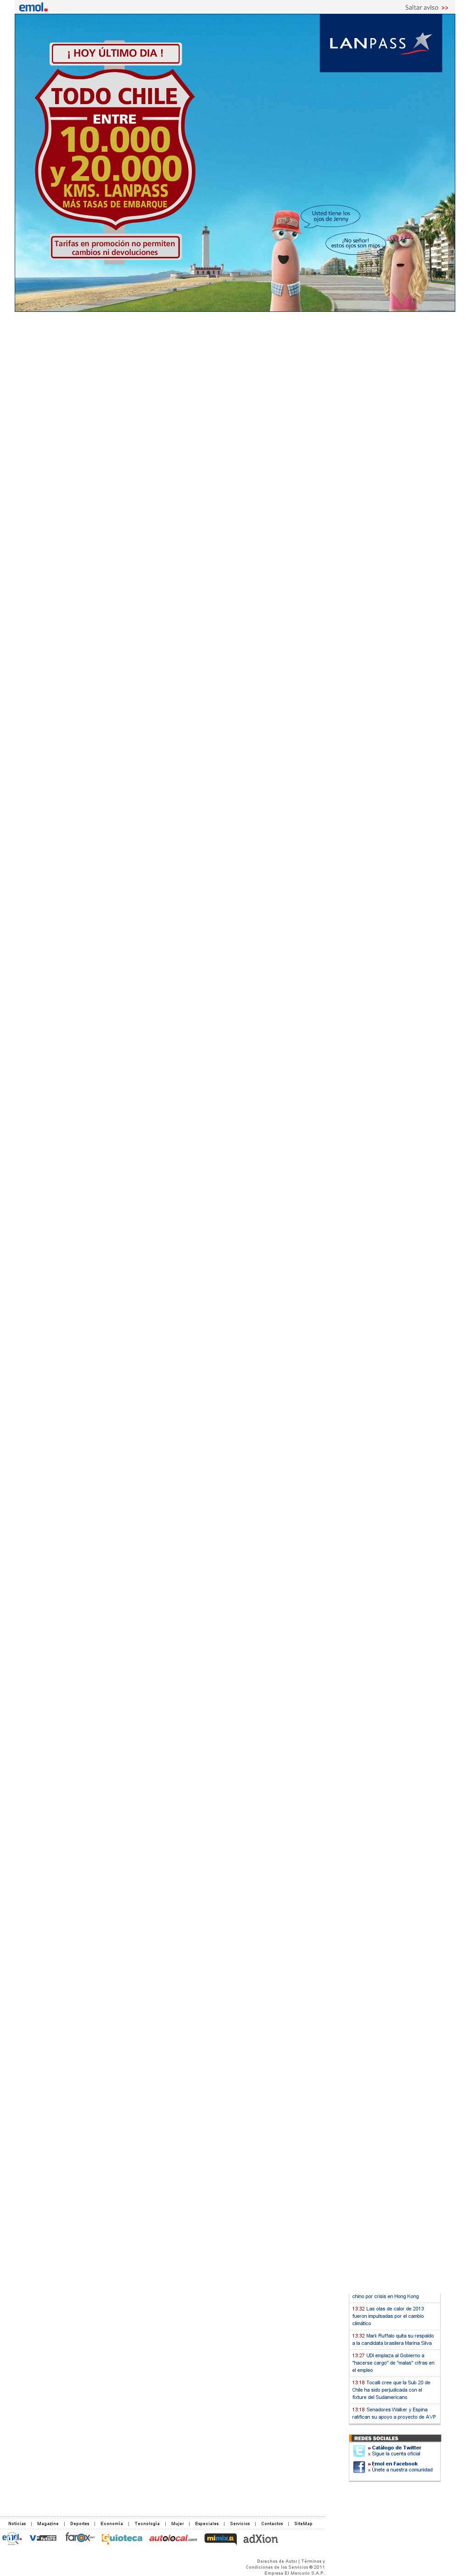 emol at Tuesday Sept. 30, 2014, 5:04 p.m. UTC